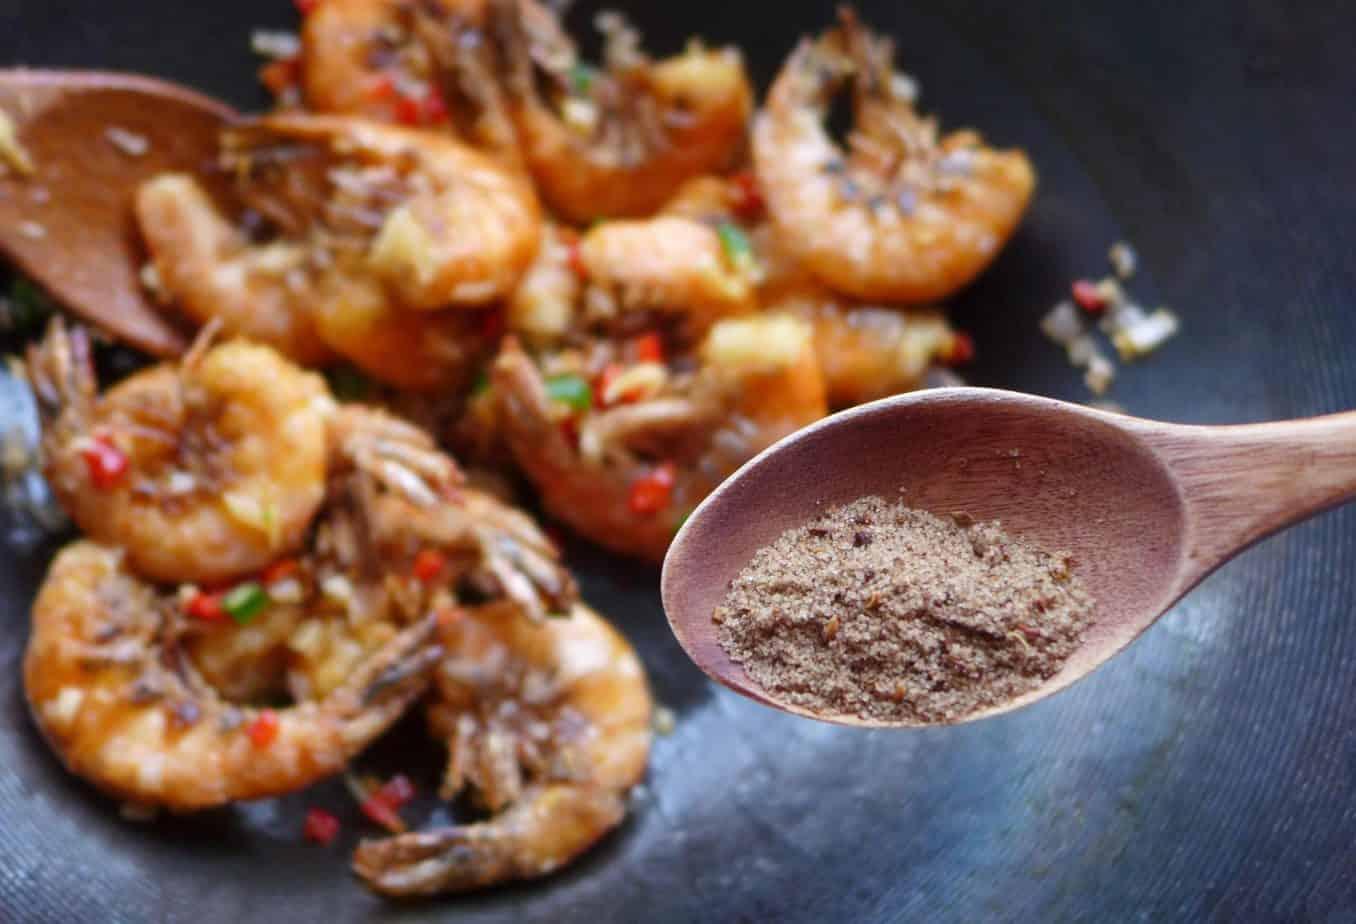 Putting salt and pepper seasoning over shrimp